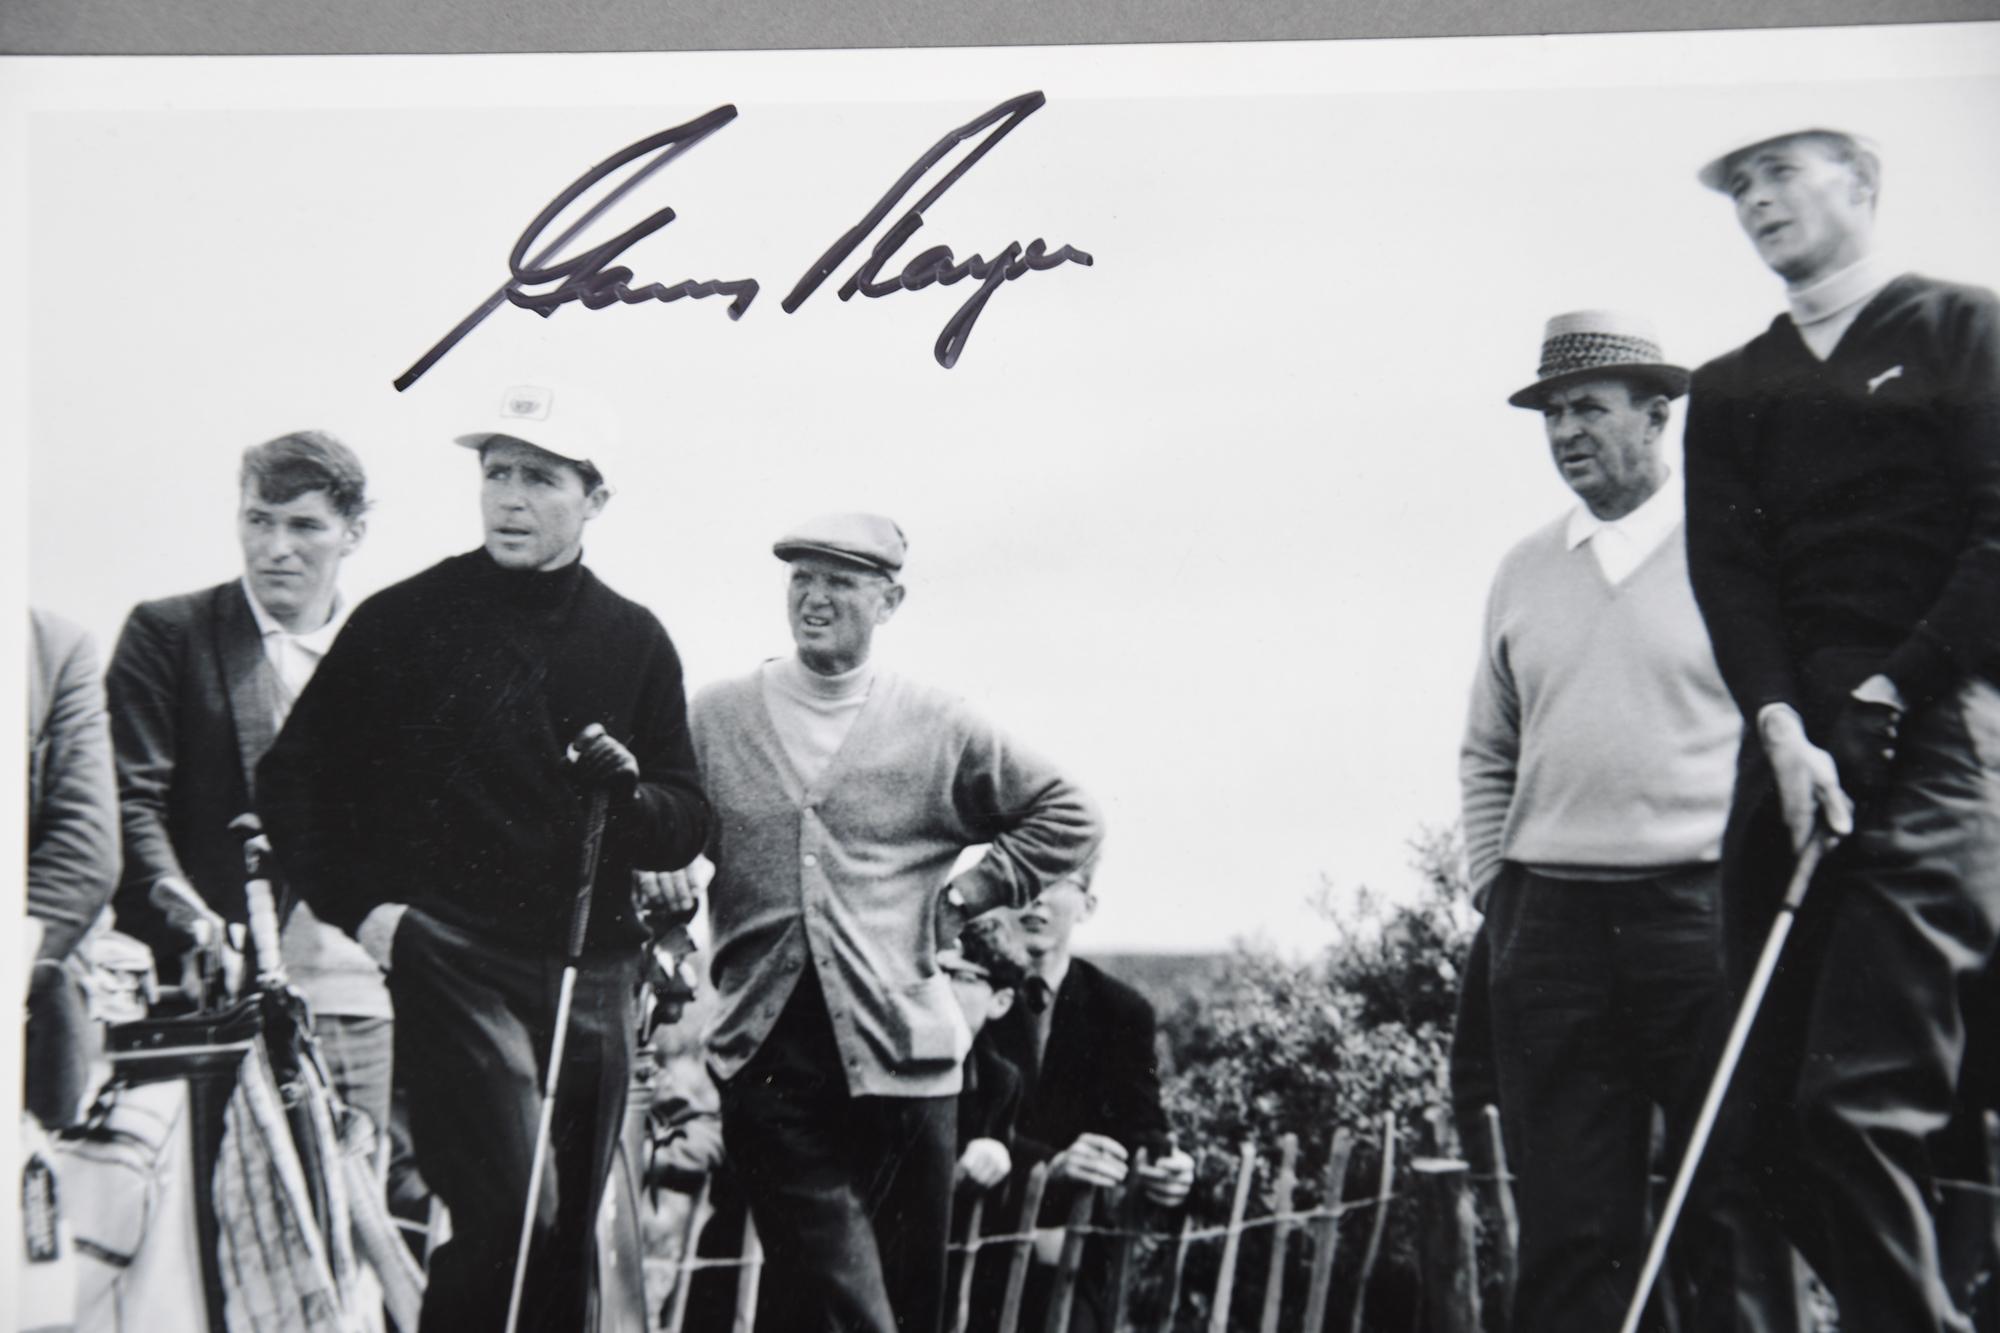 JACK NICKLAUS, GARY PLAYER & ARNOLD PALMER Original signatures. - Image 2 of 4